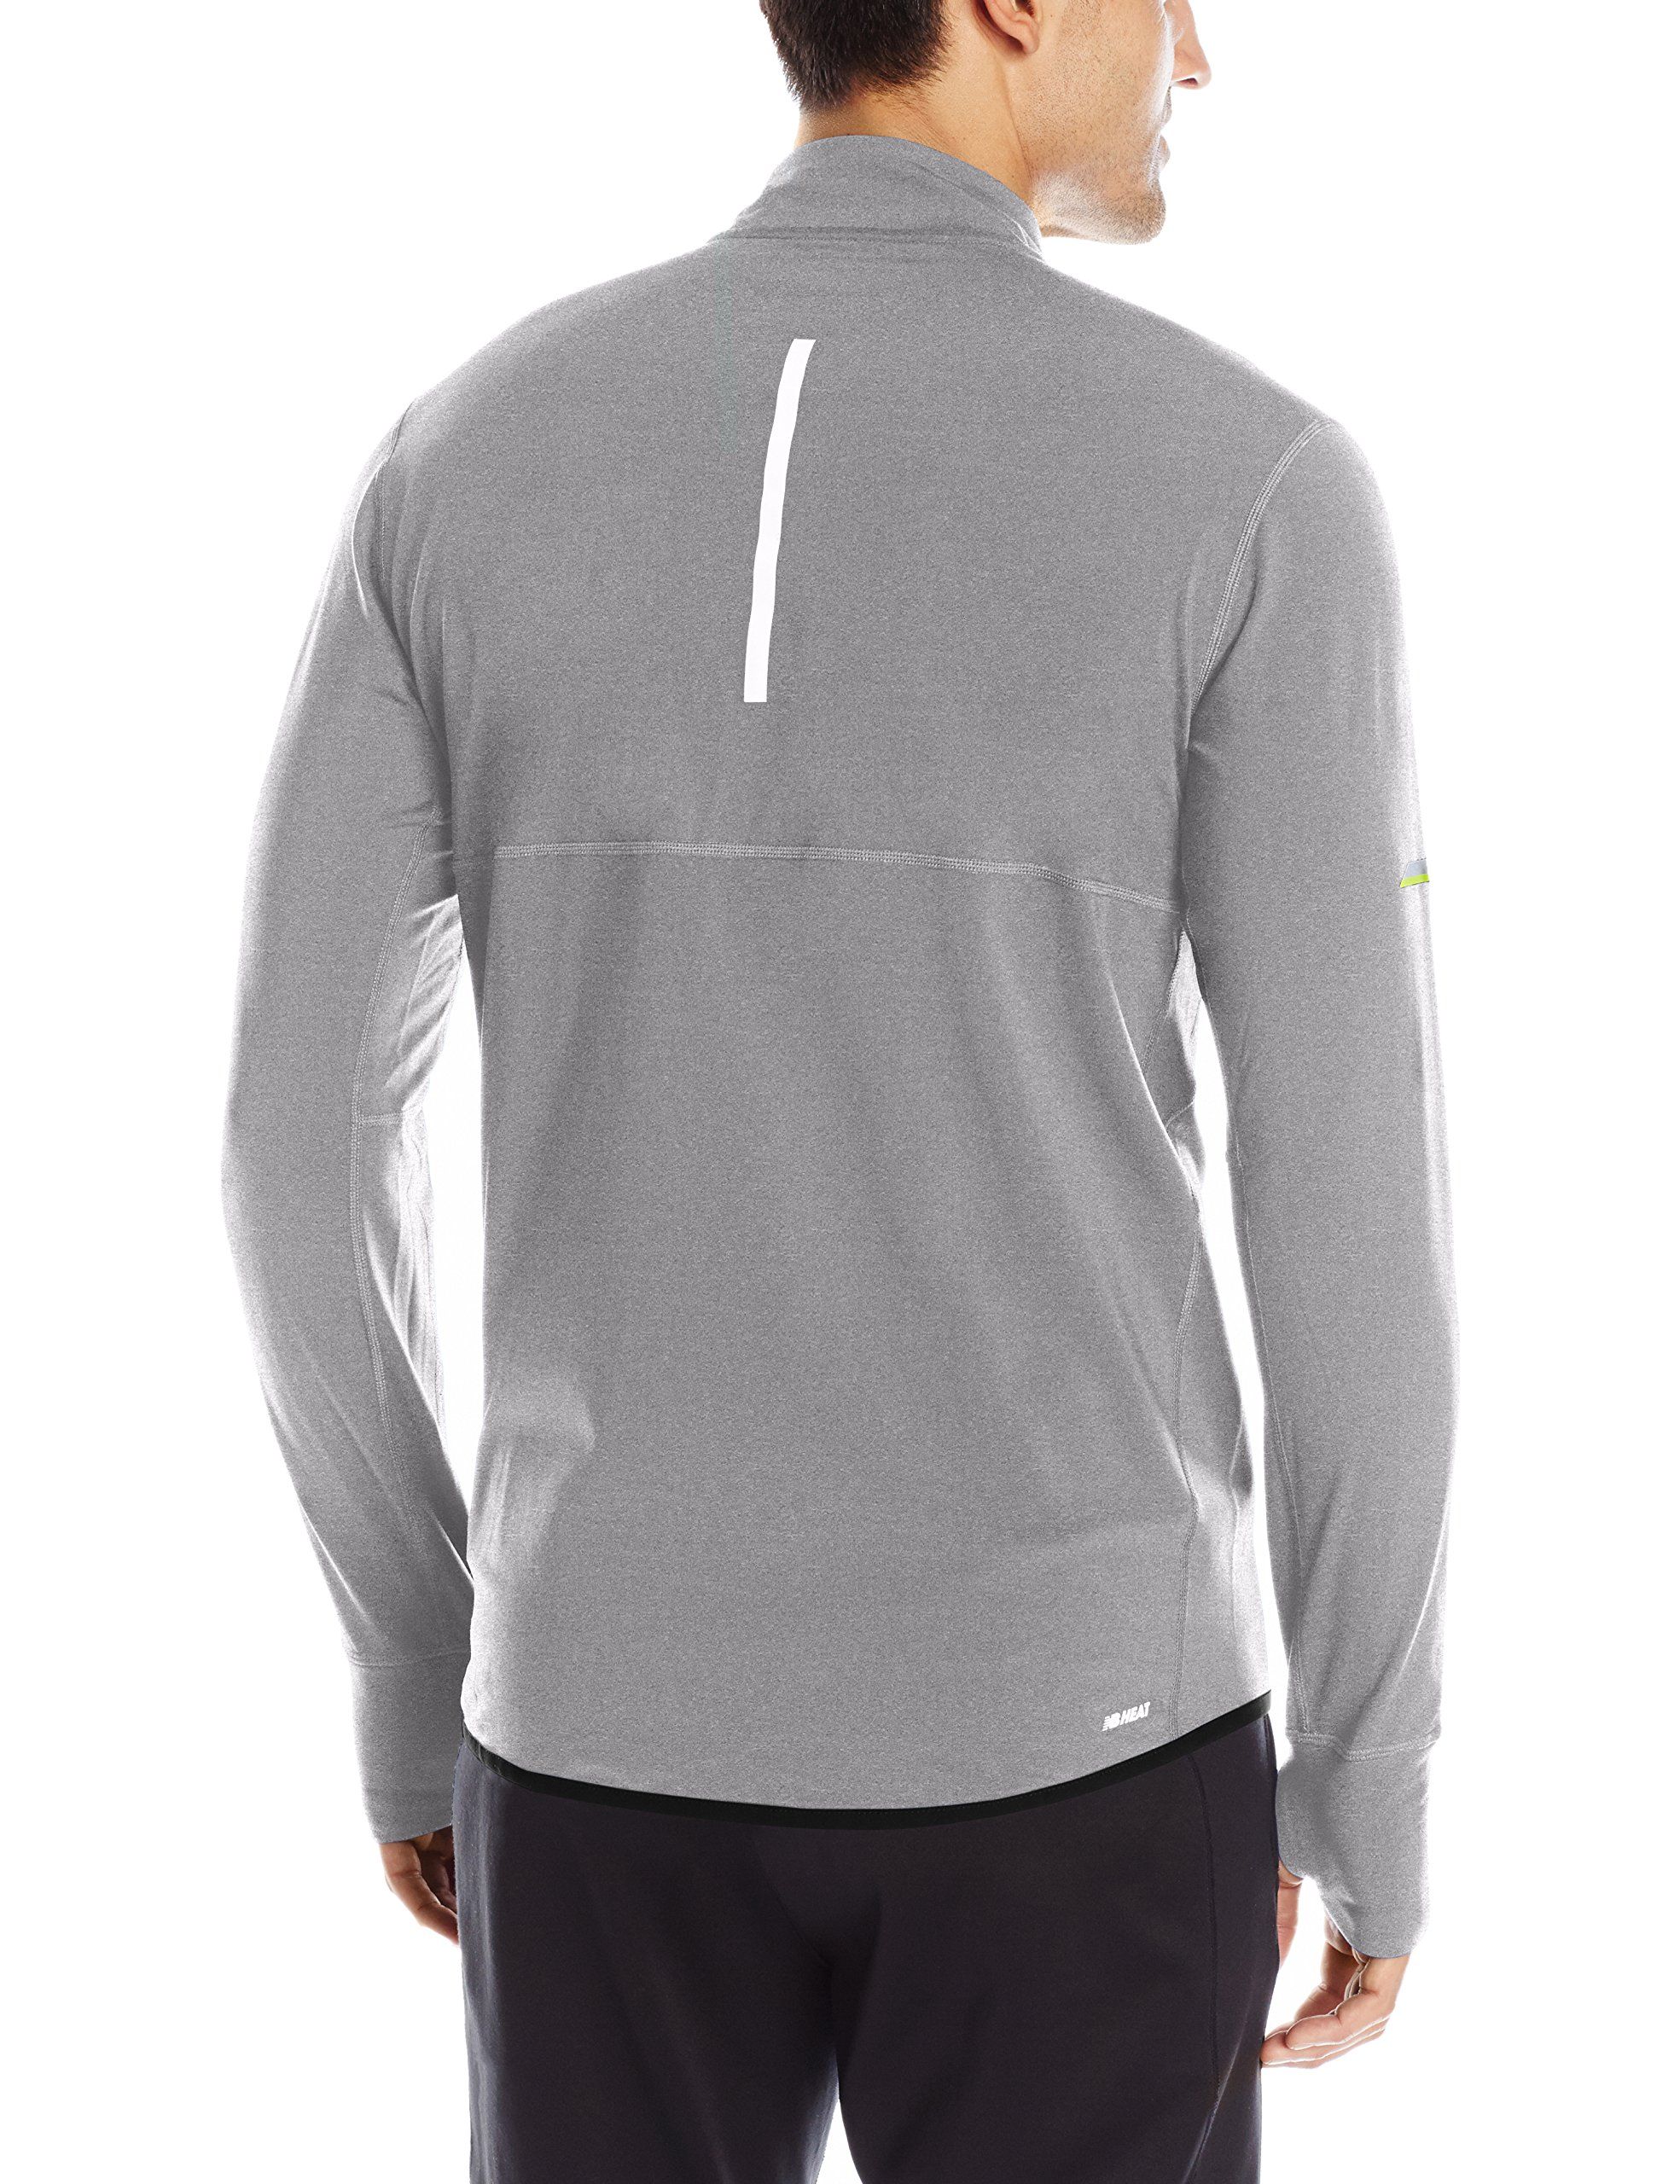 New Balance Men's Heat Half Zip Jacket, Athletic Grey, Small by New Balance (Image #2)